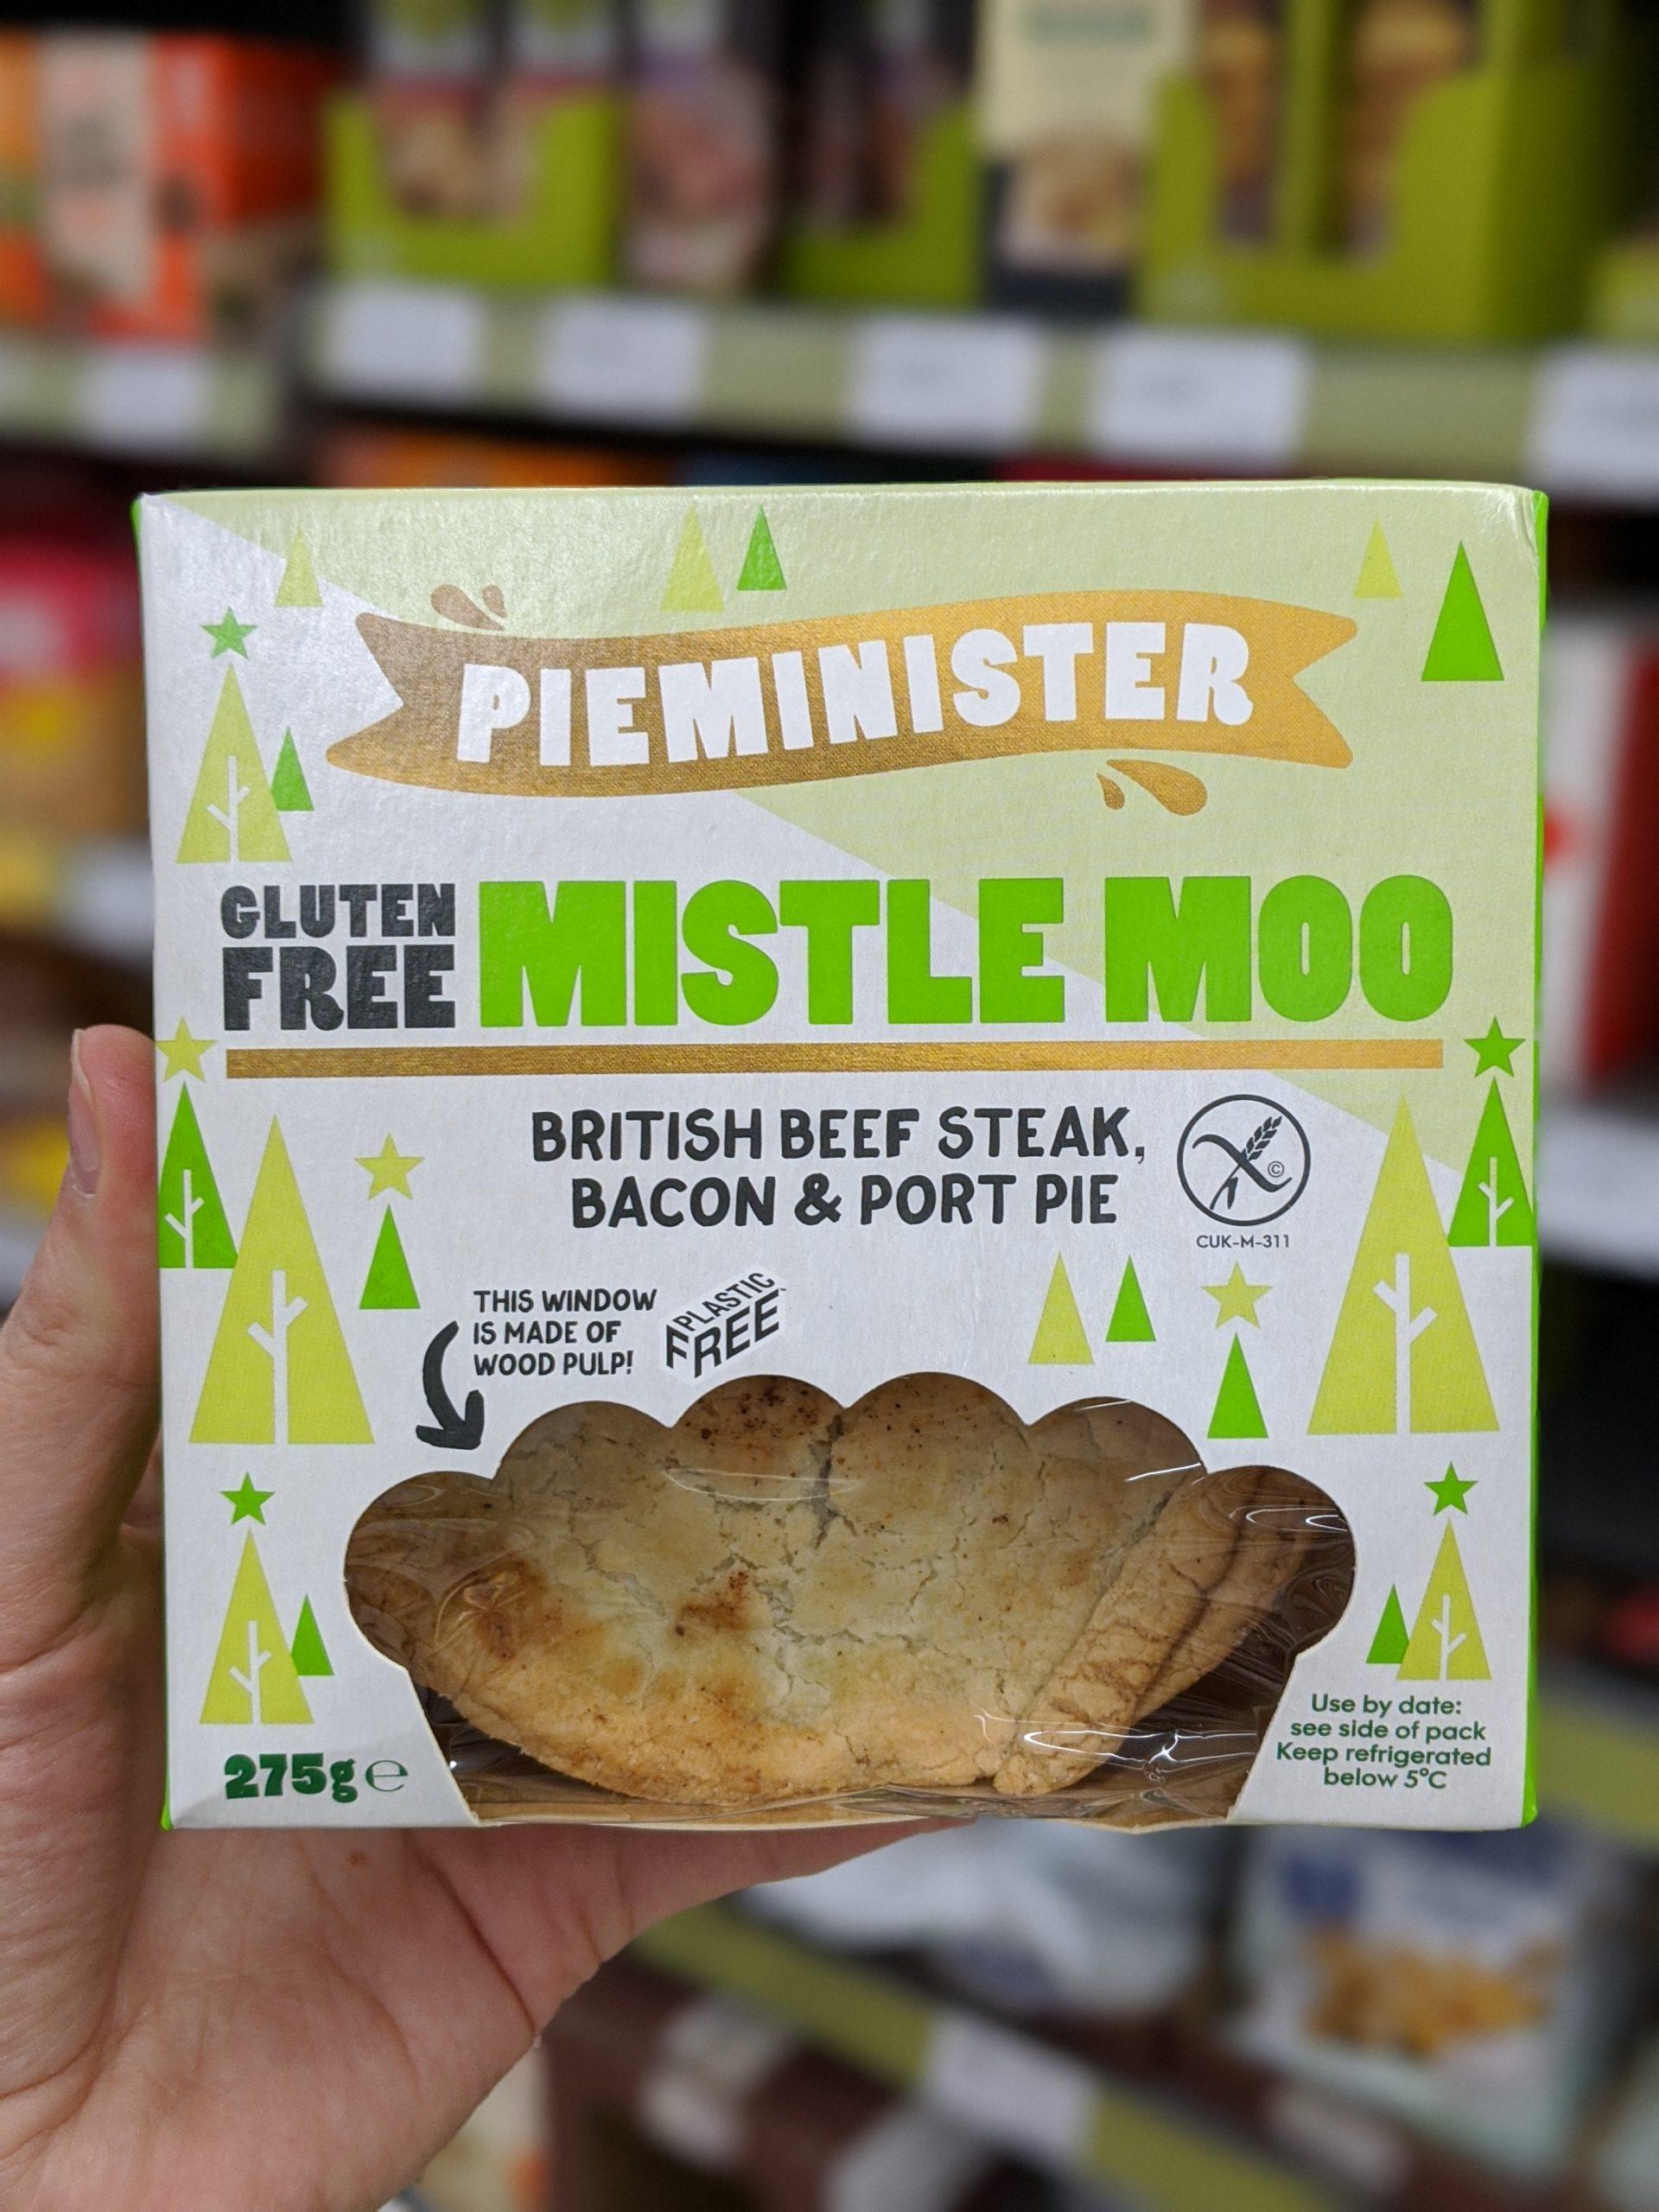 pieminister gluten free mistle moo gluten free christmas pie